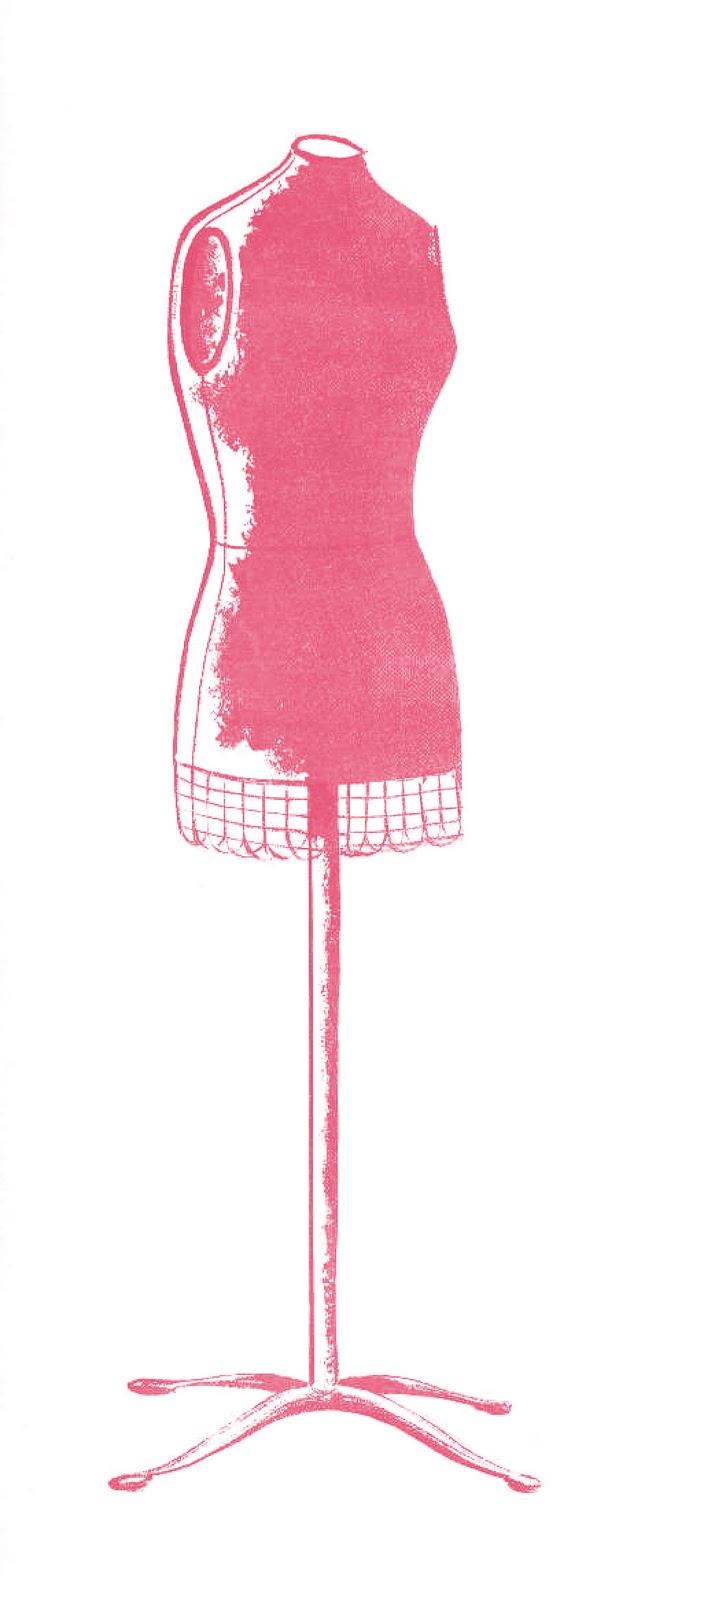 Dress clipart pink Form Form Clipart Dress Clipart